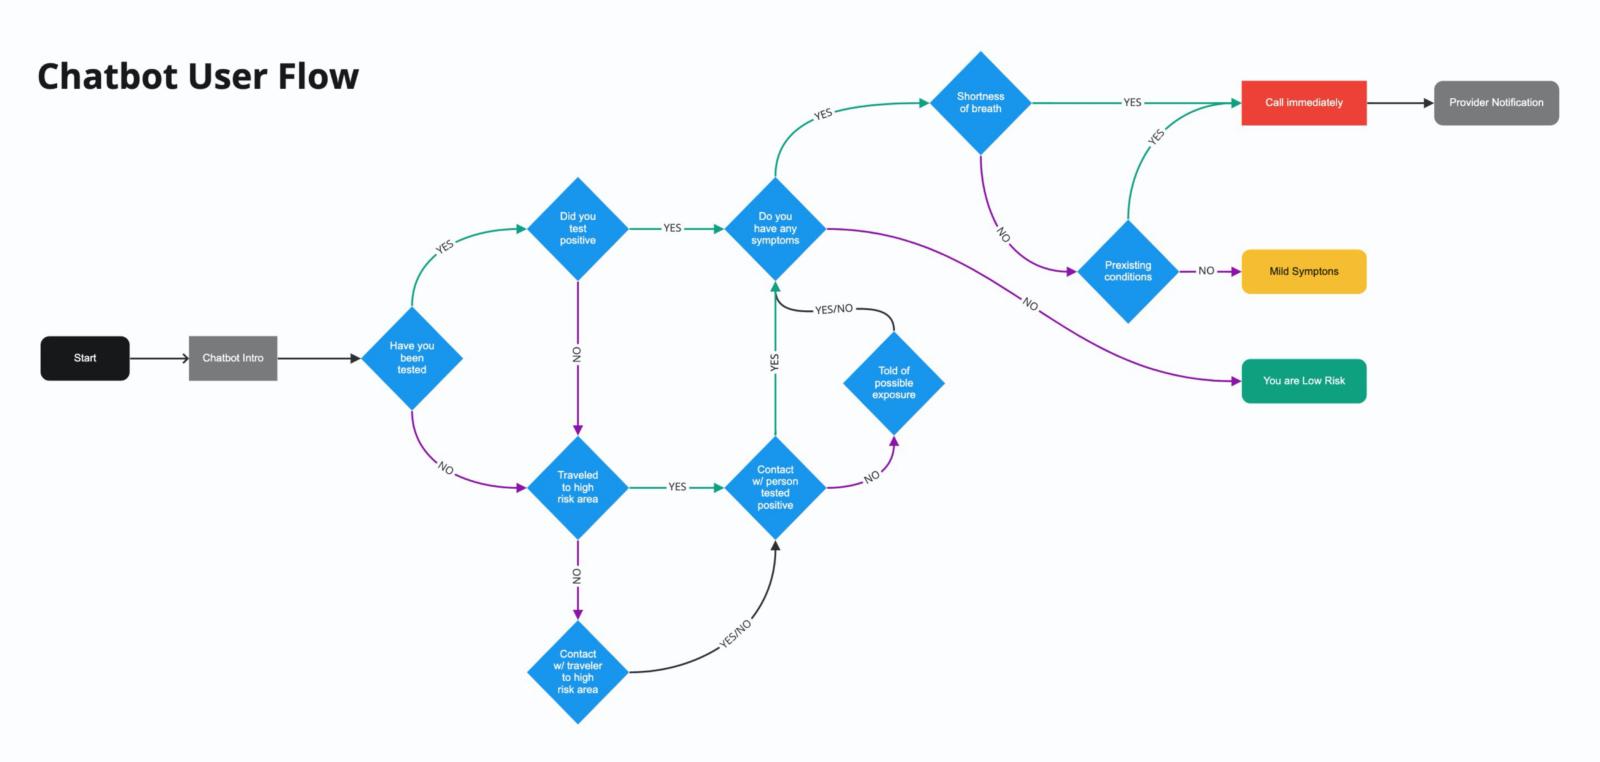 chatbot user flow diagram